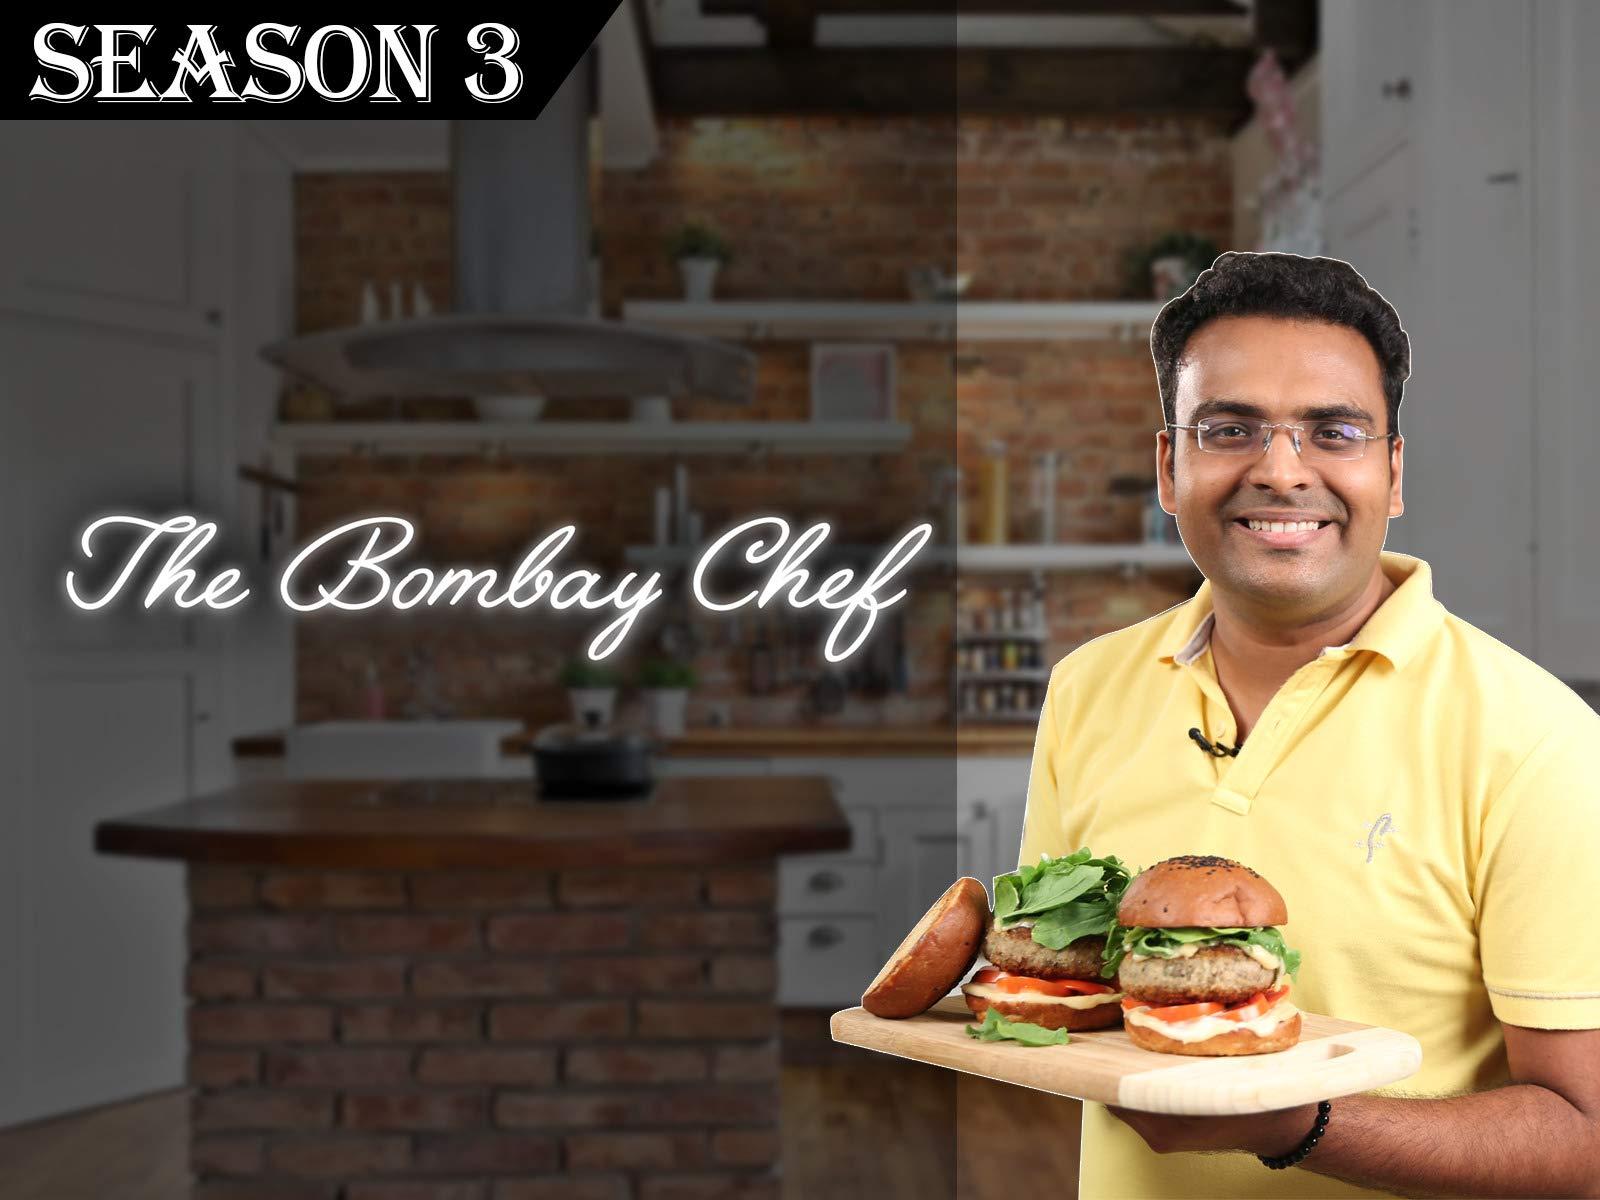 The Bombay Chef - Season 3